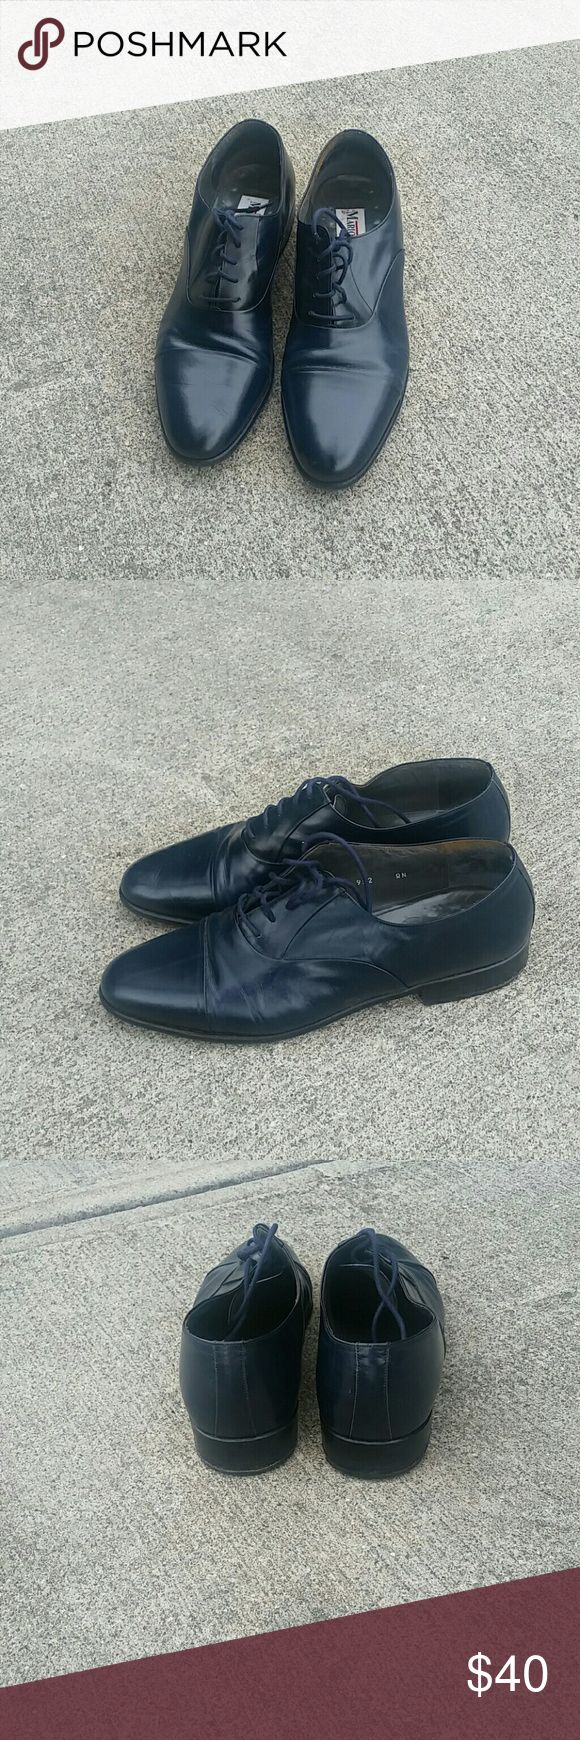 Navy blue dress shoes Navy blue dress shoes gently worn Mario bruni Shoes